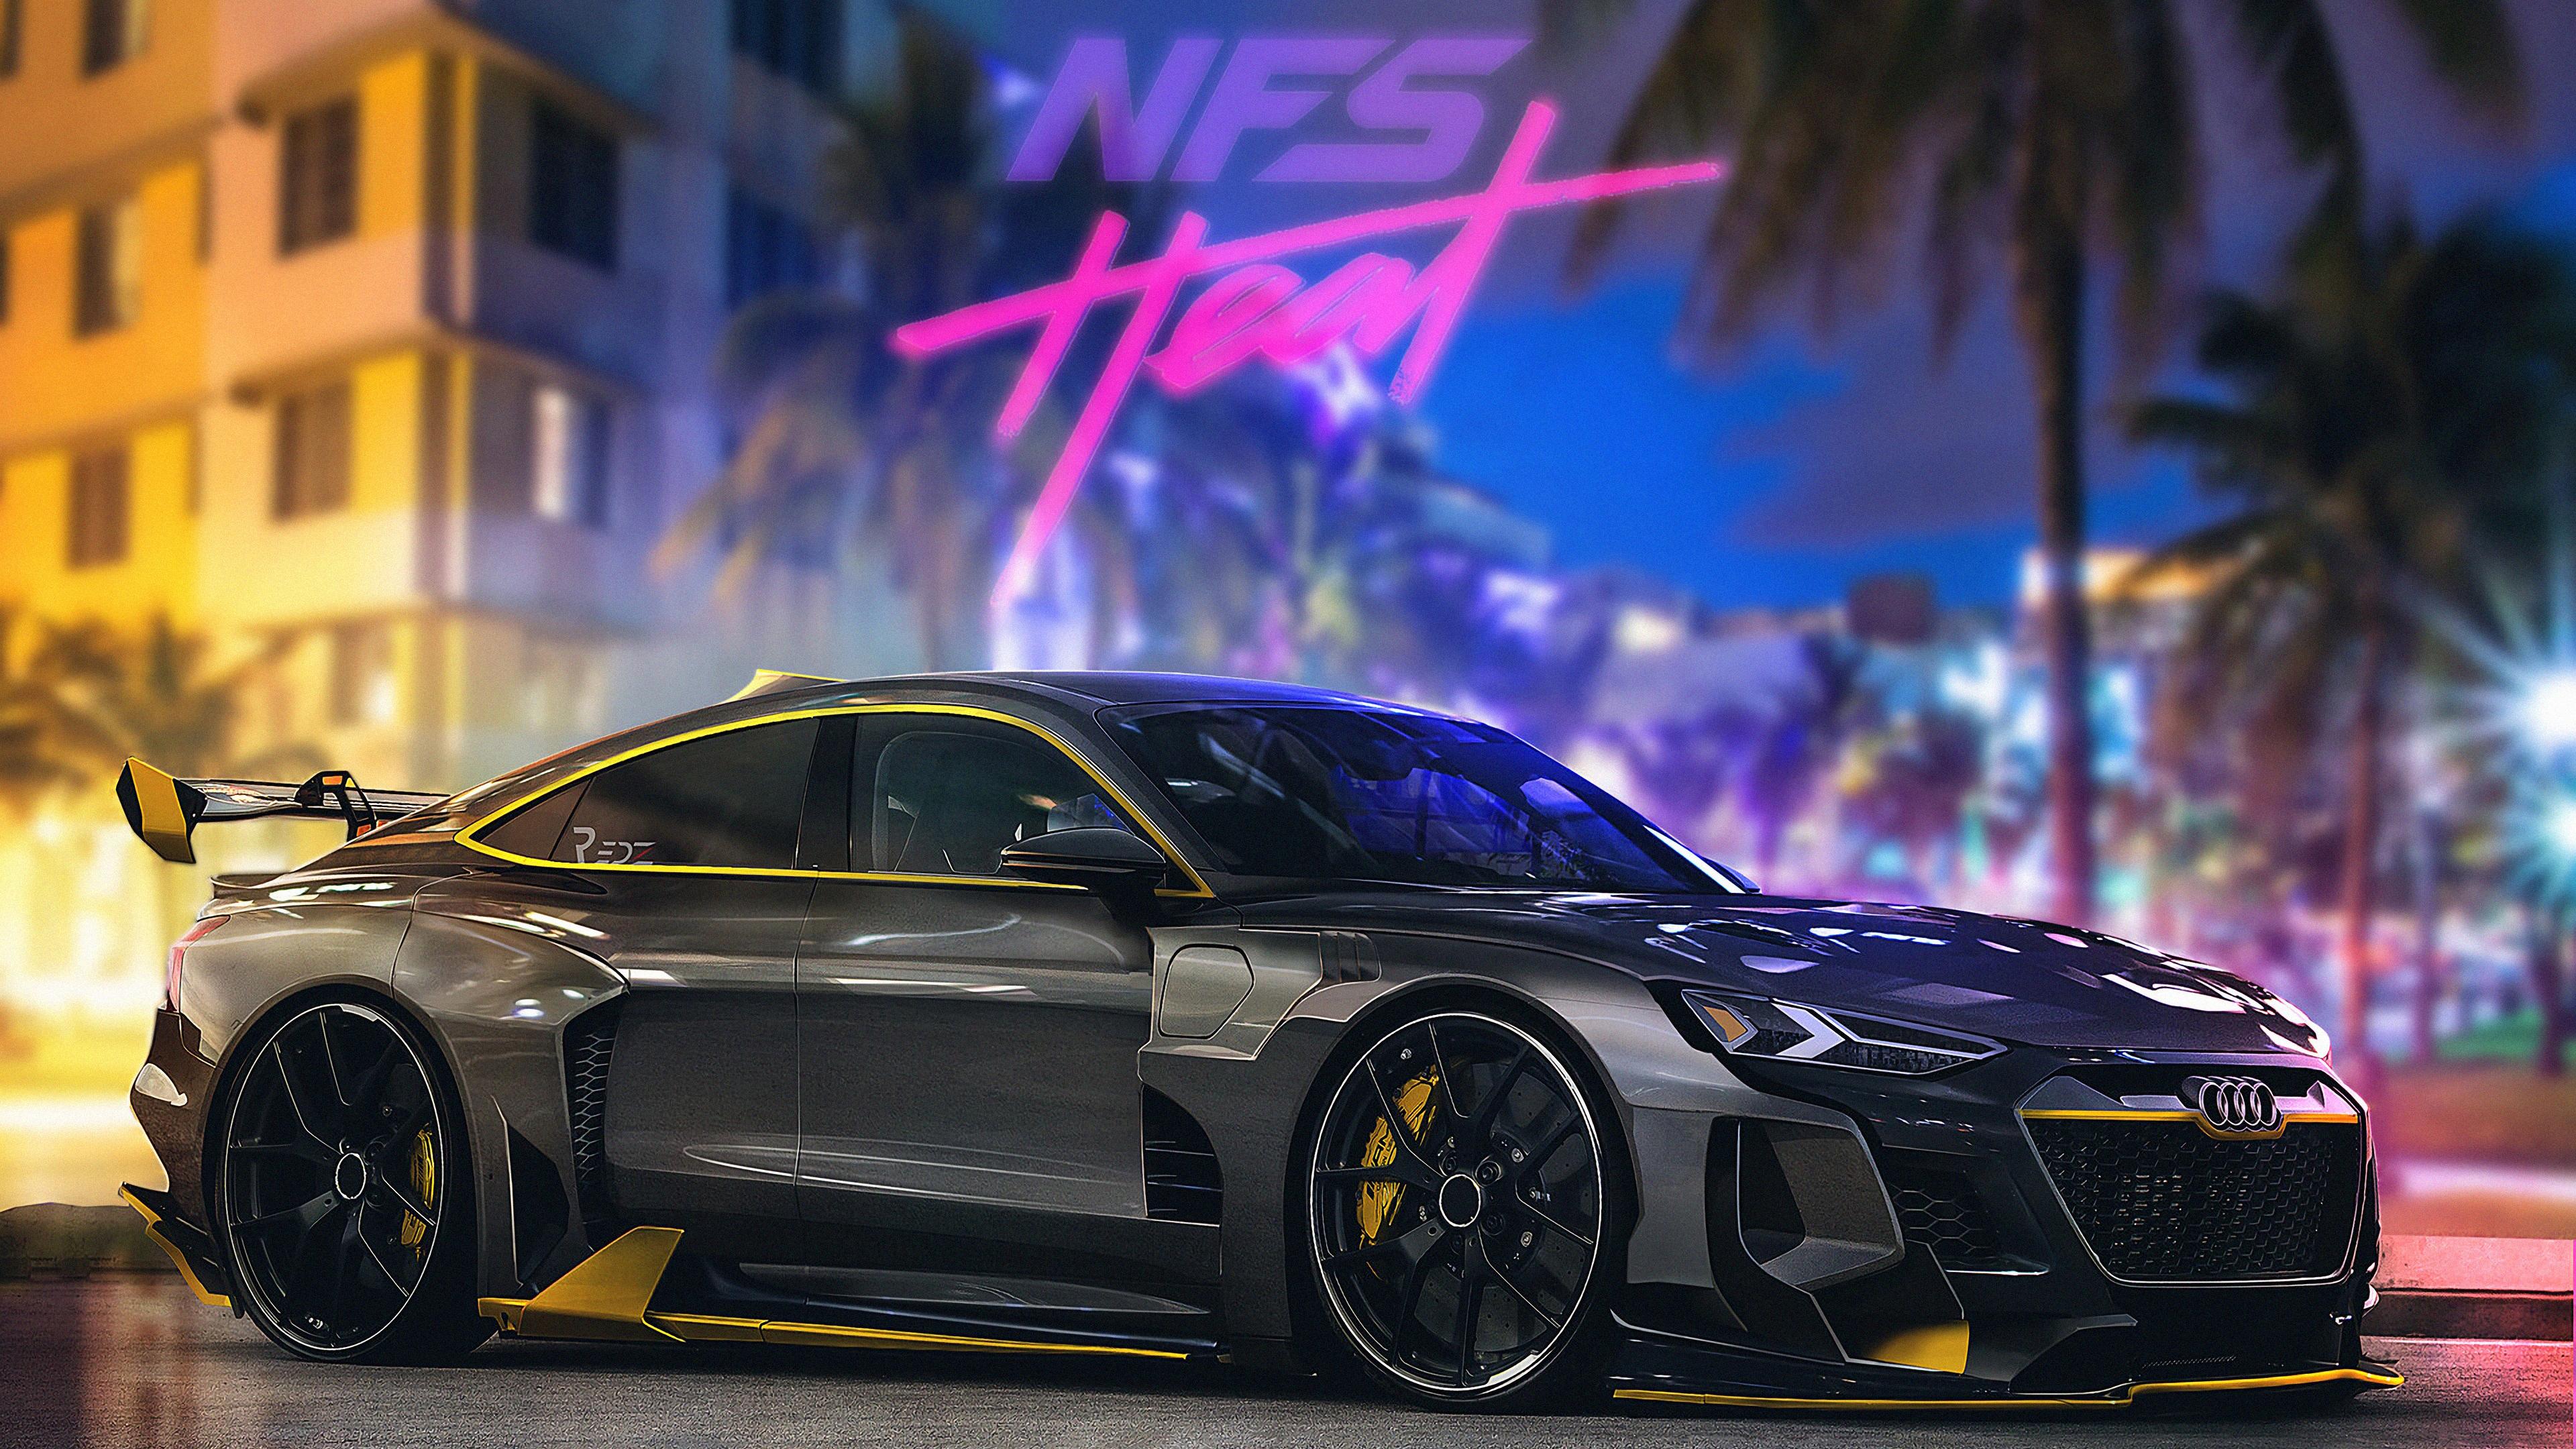 Fondos de pantalla Audi E-TRON NFS Heat